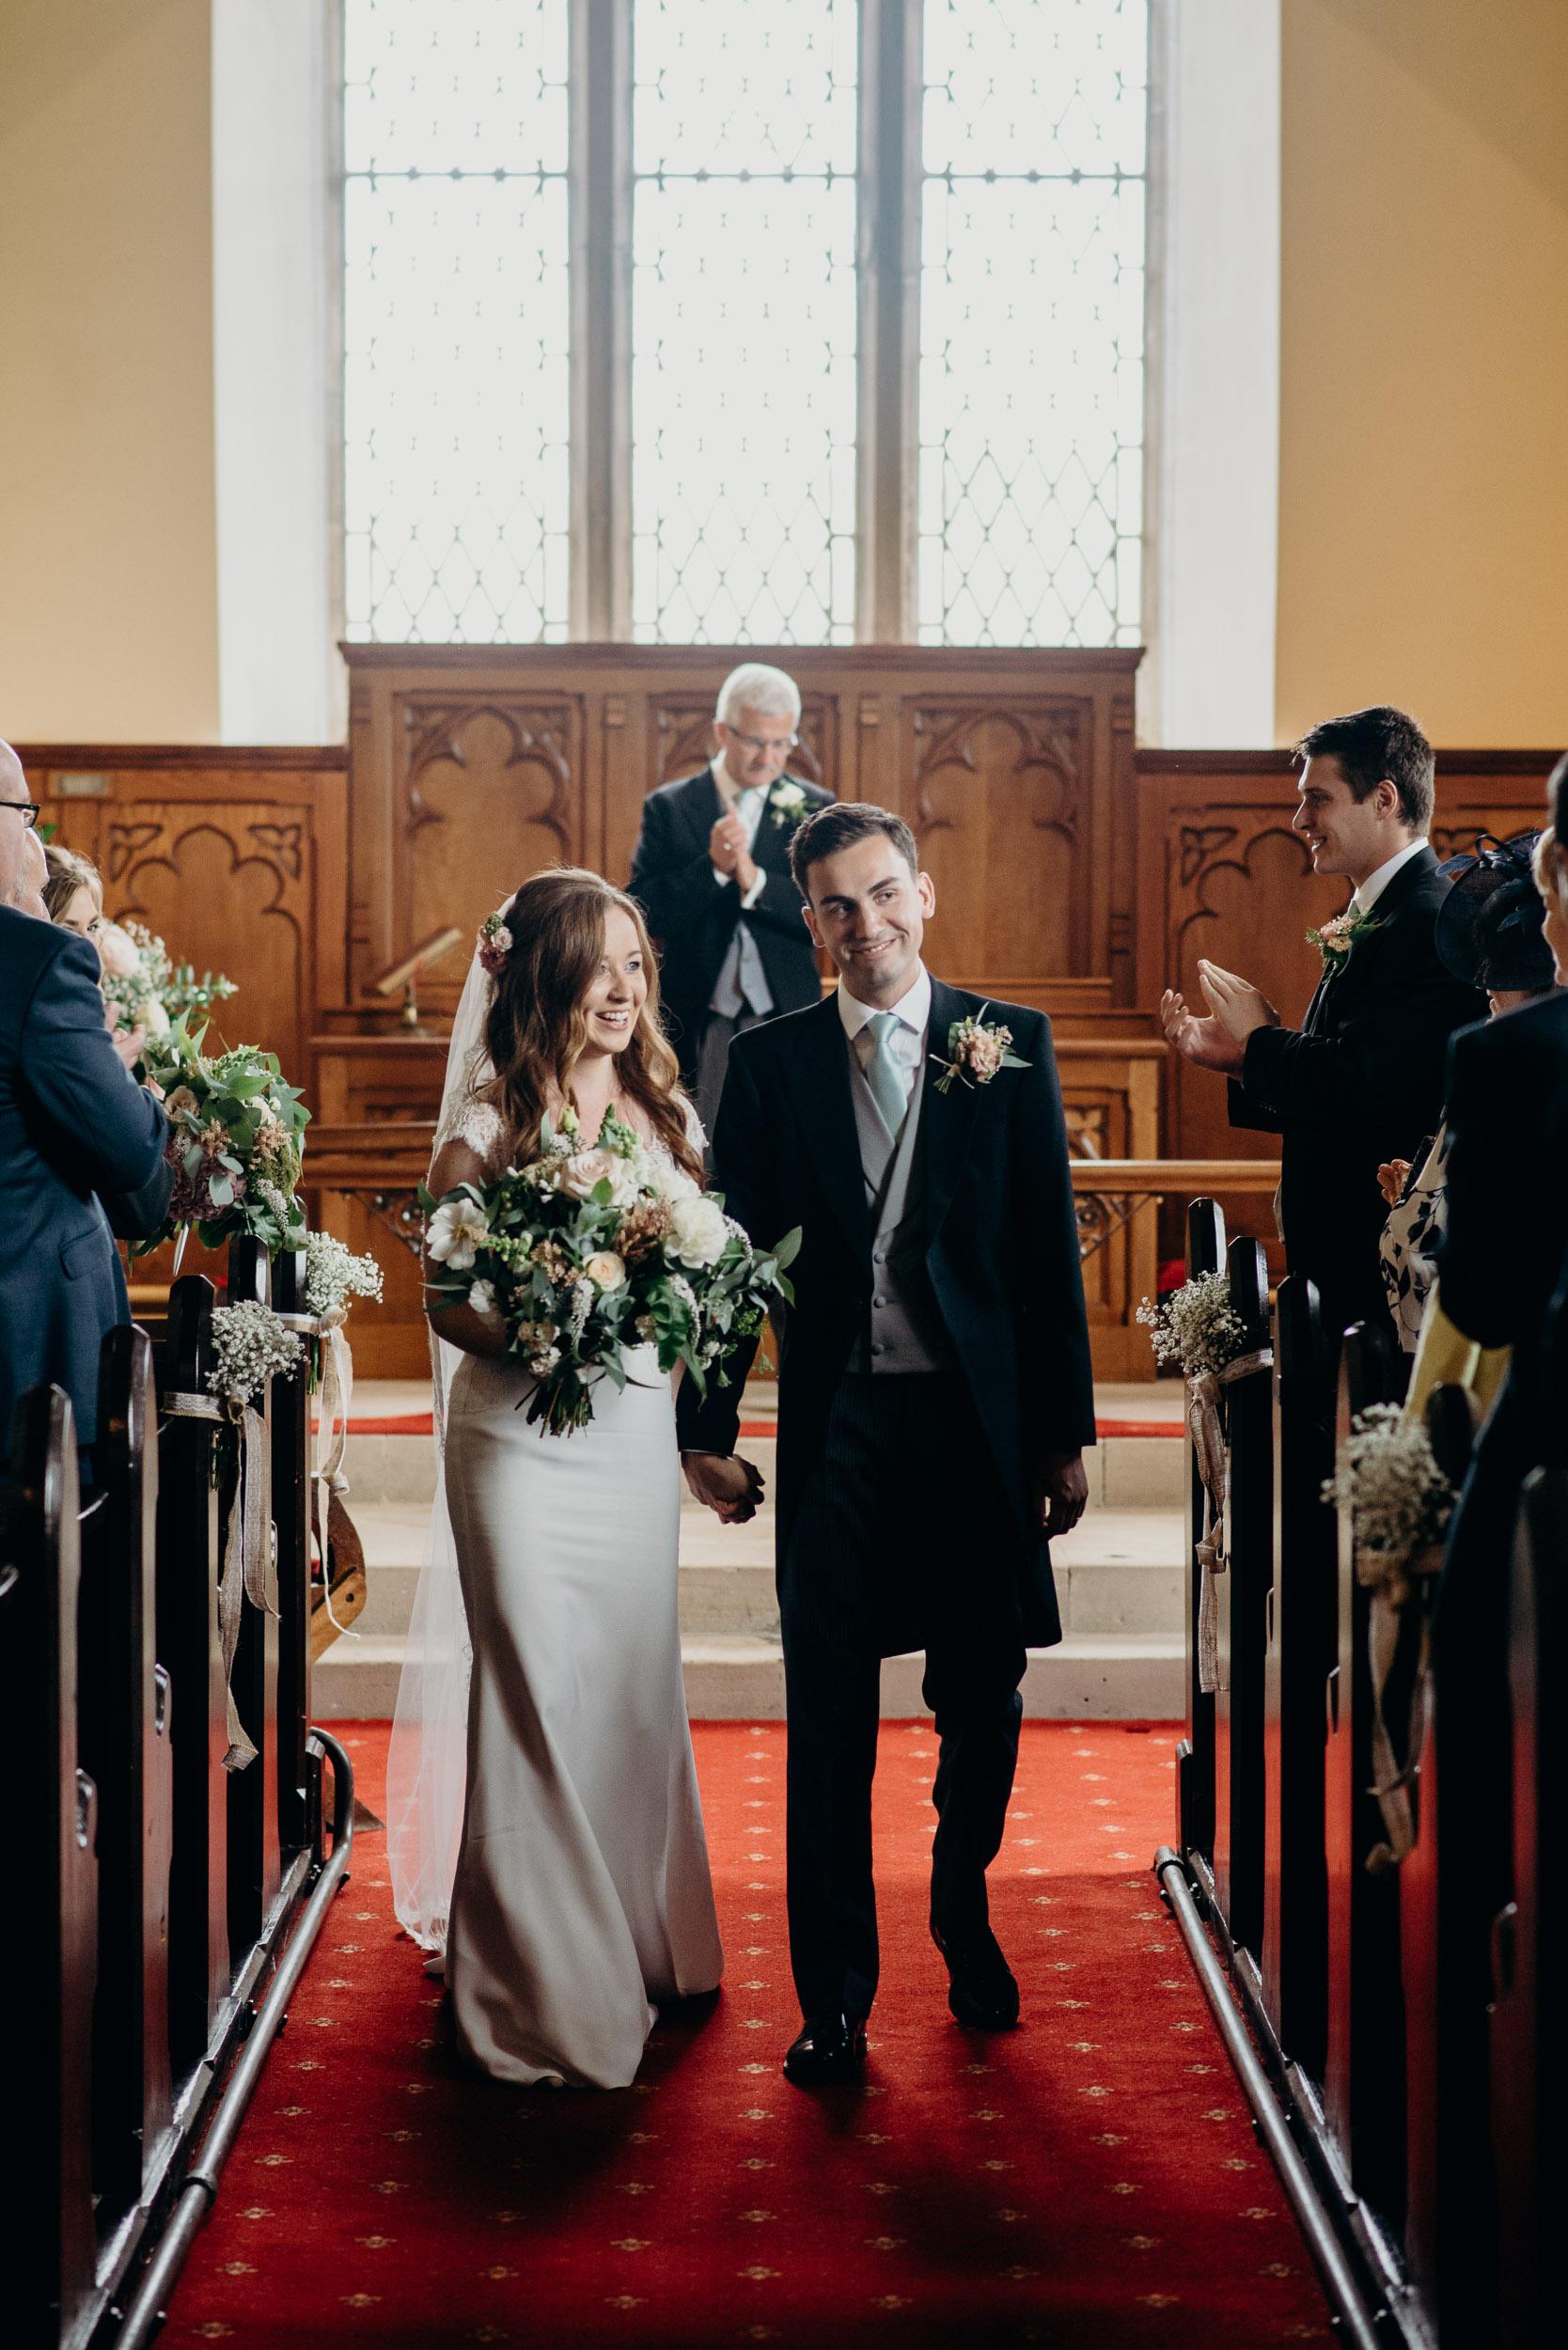 drenagh estate wedding photography-54.jpg